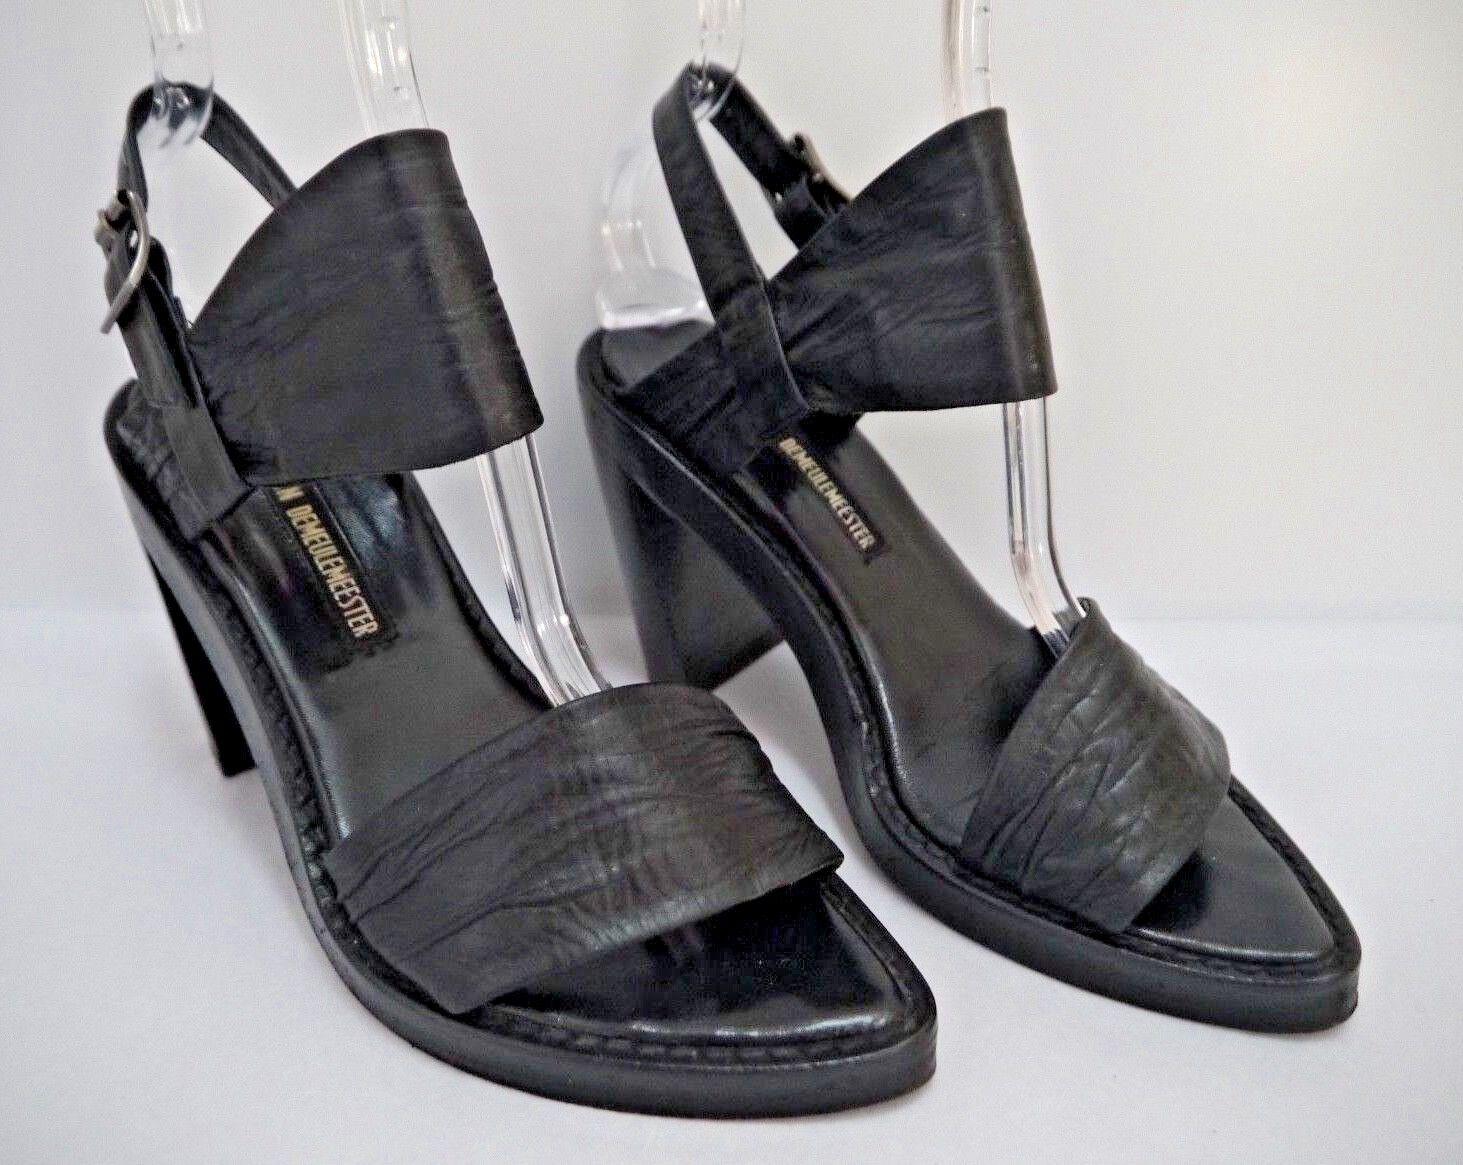 ANN DEMEULEMEESTER schwarz leather slant heel sandals Größe 37.5